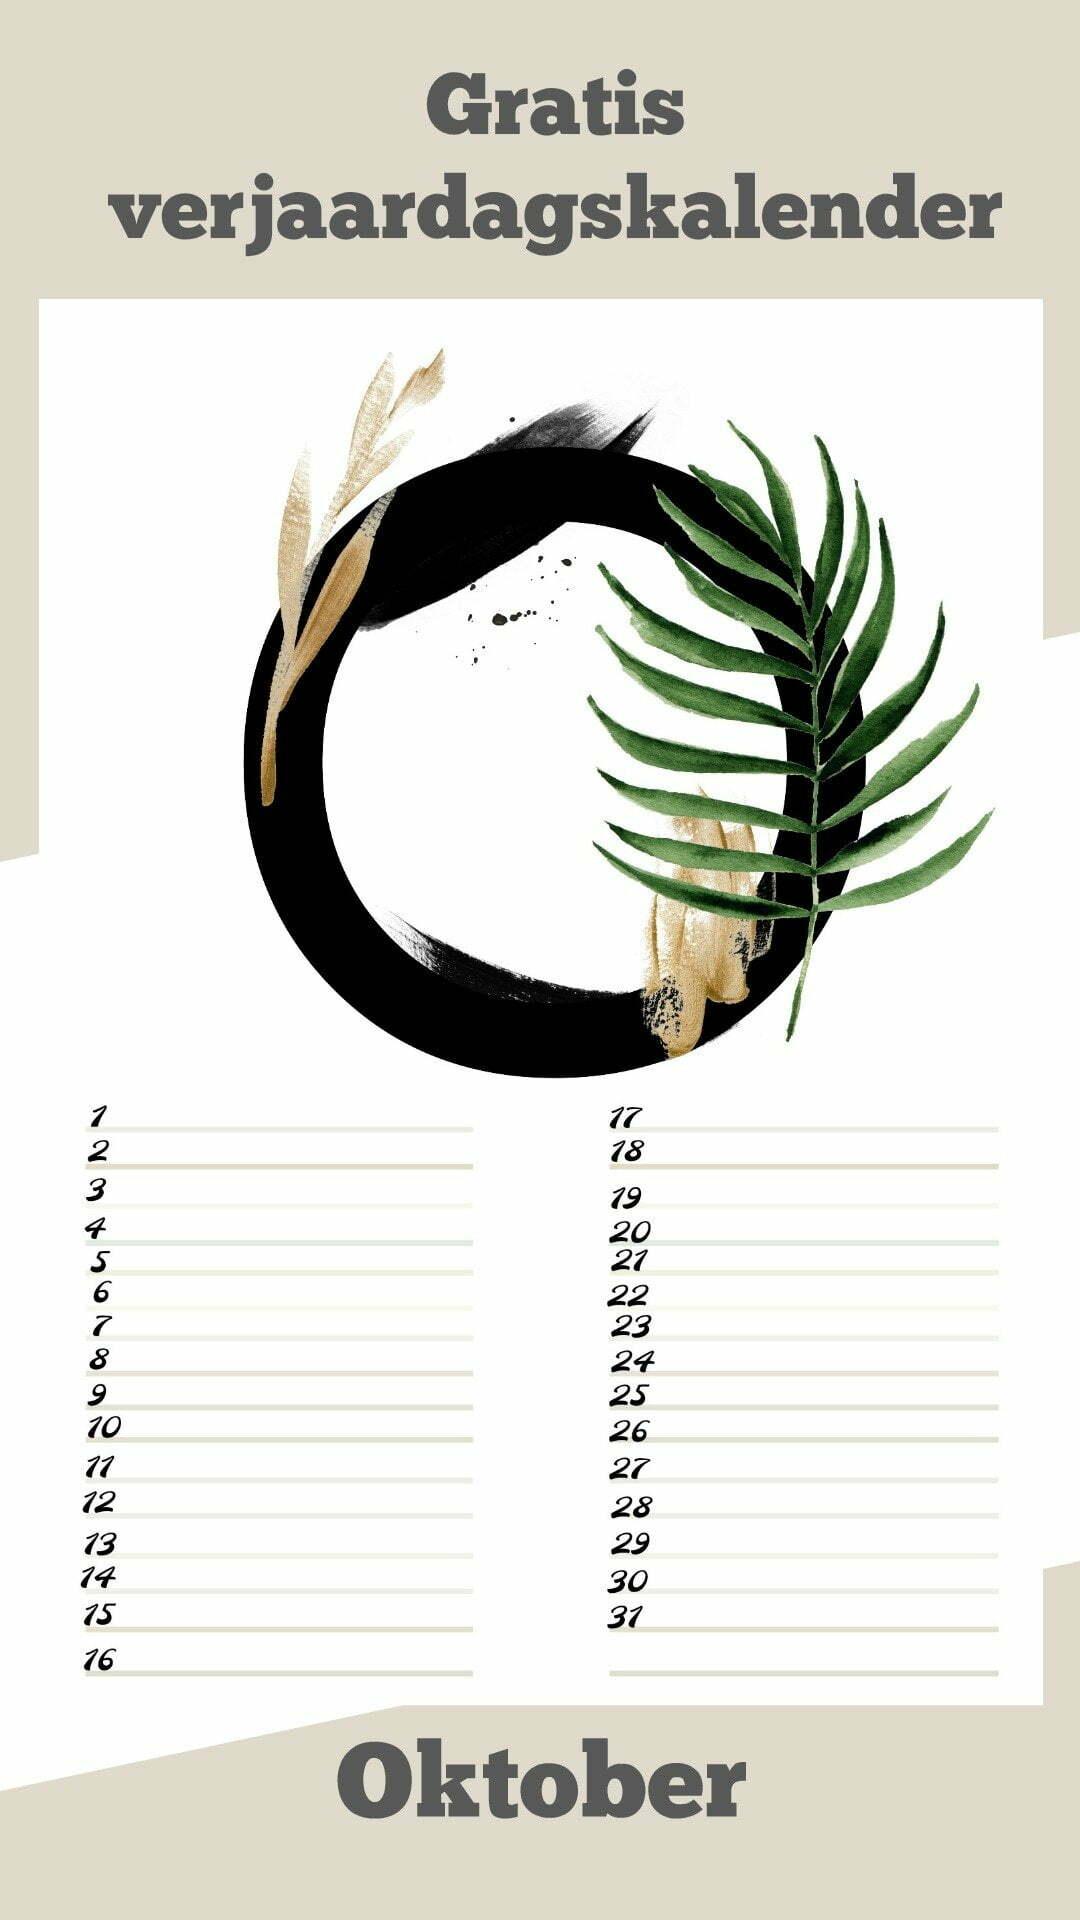 Gratis verjaardagskalender alfabet van Oktober